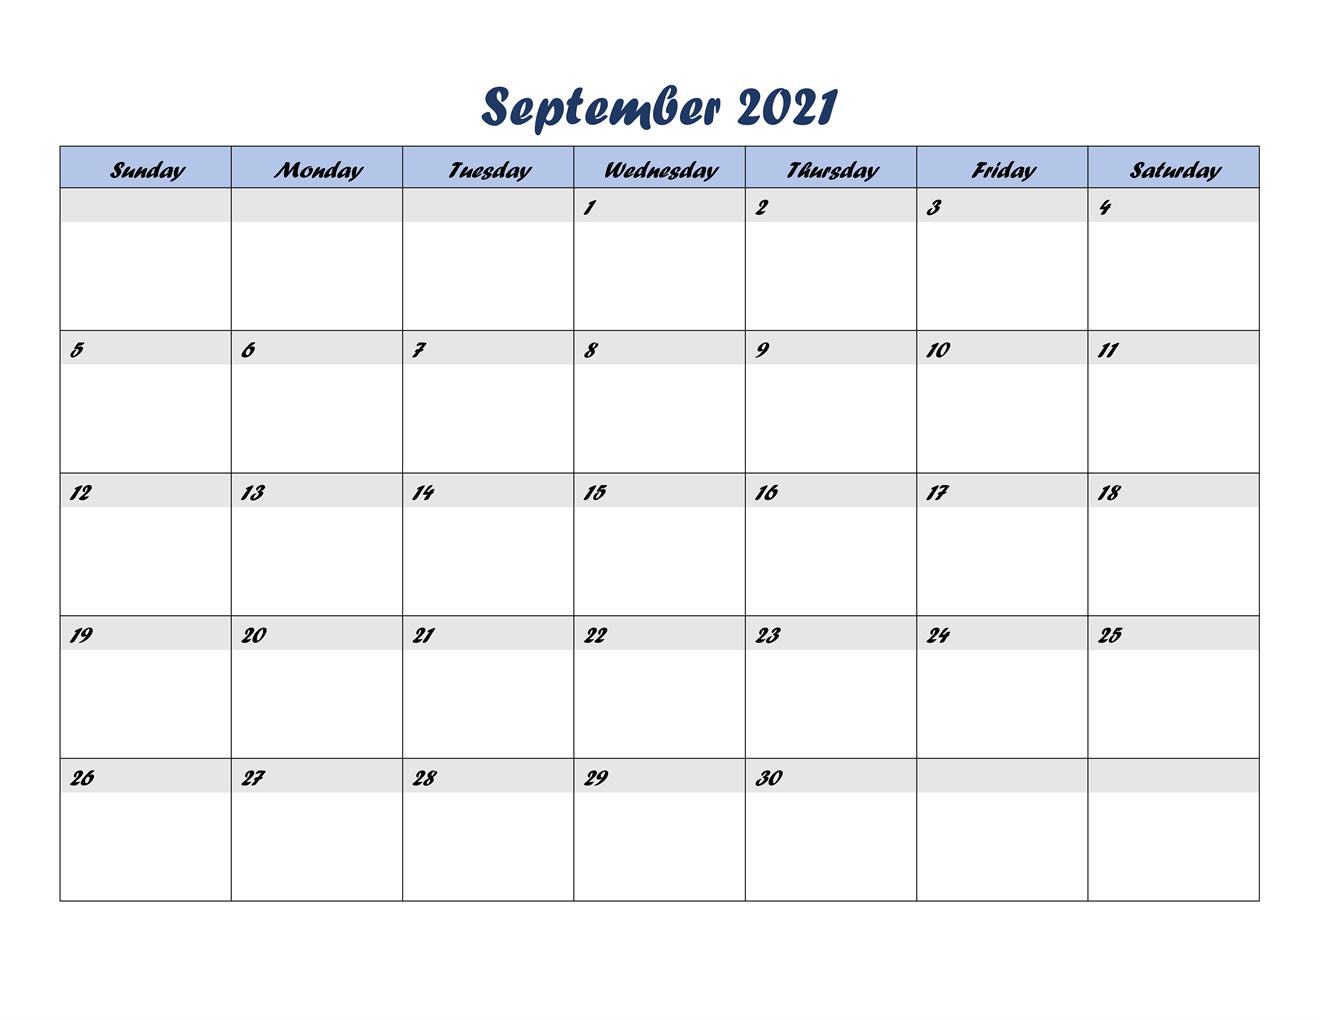 2021 Calendar September With Holidays